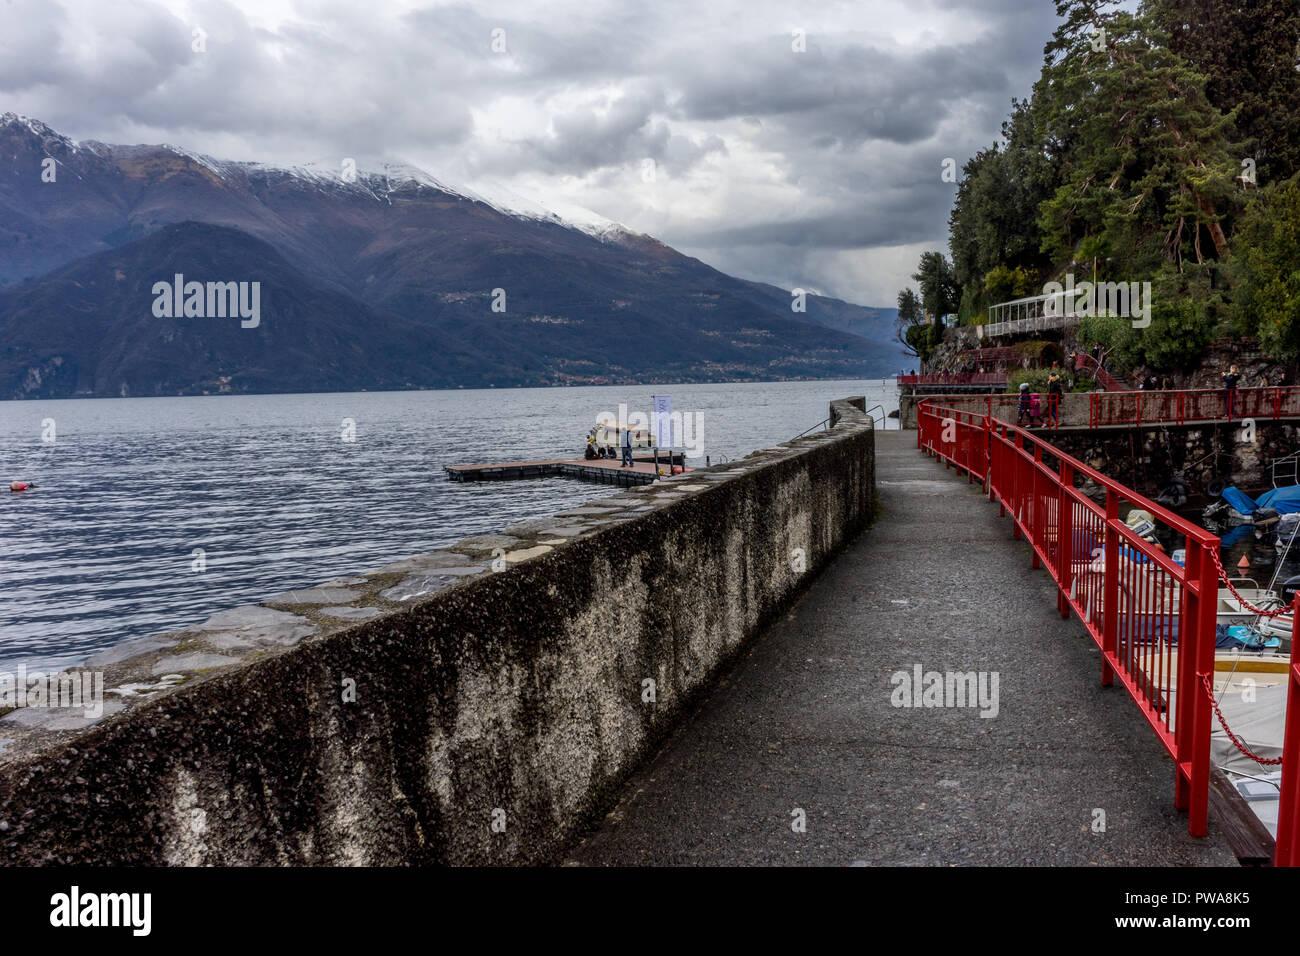 Varenna, Italy - March 31, 2018: People walk across a bridge on Lake Como at Varenna, Italy - Stock Image